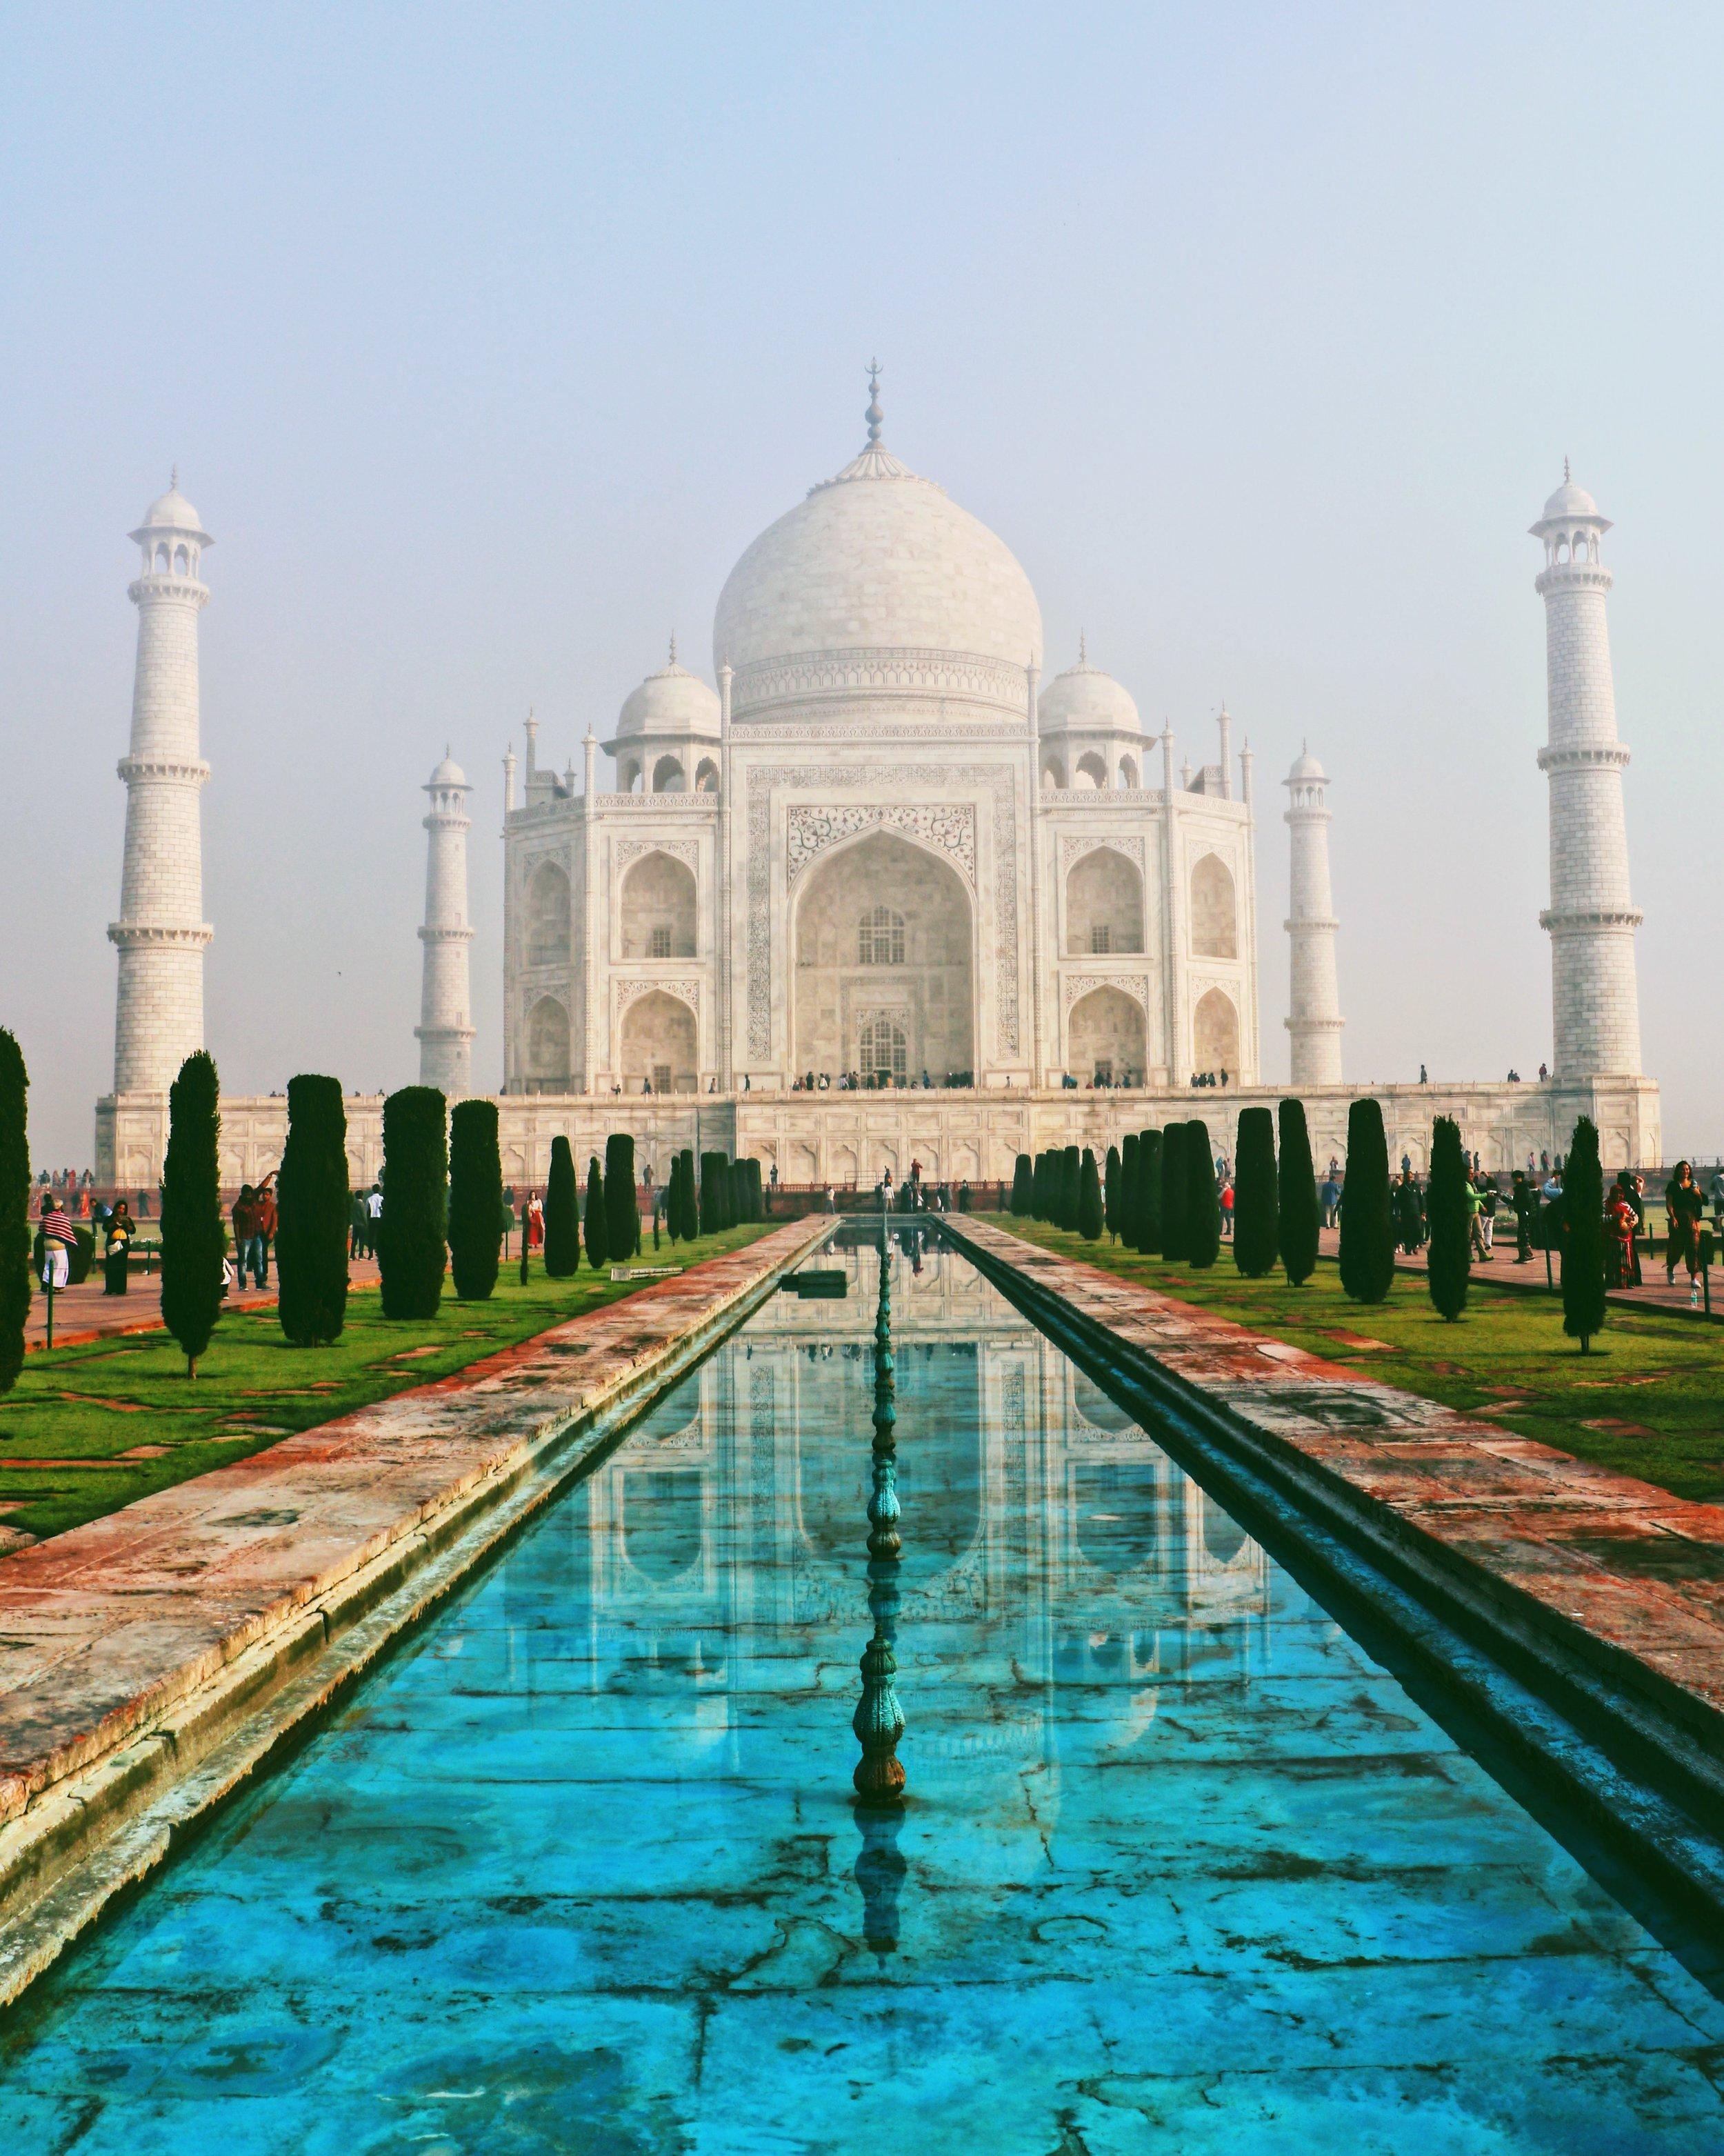 The Taj Mahal in all it's beautiful glory.